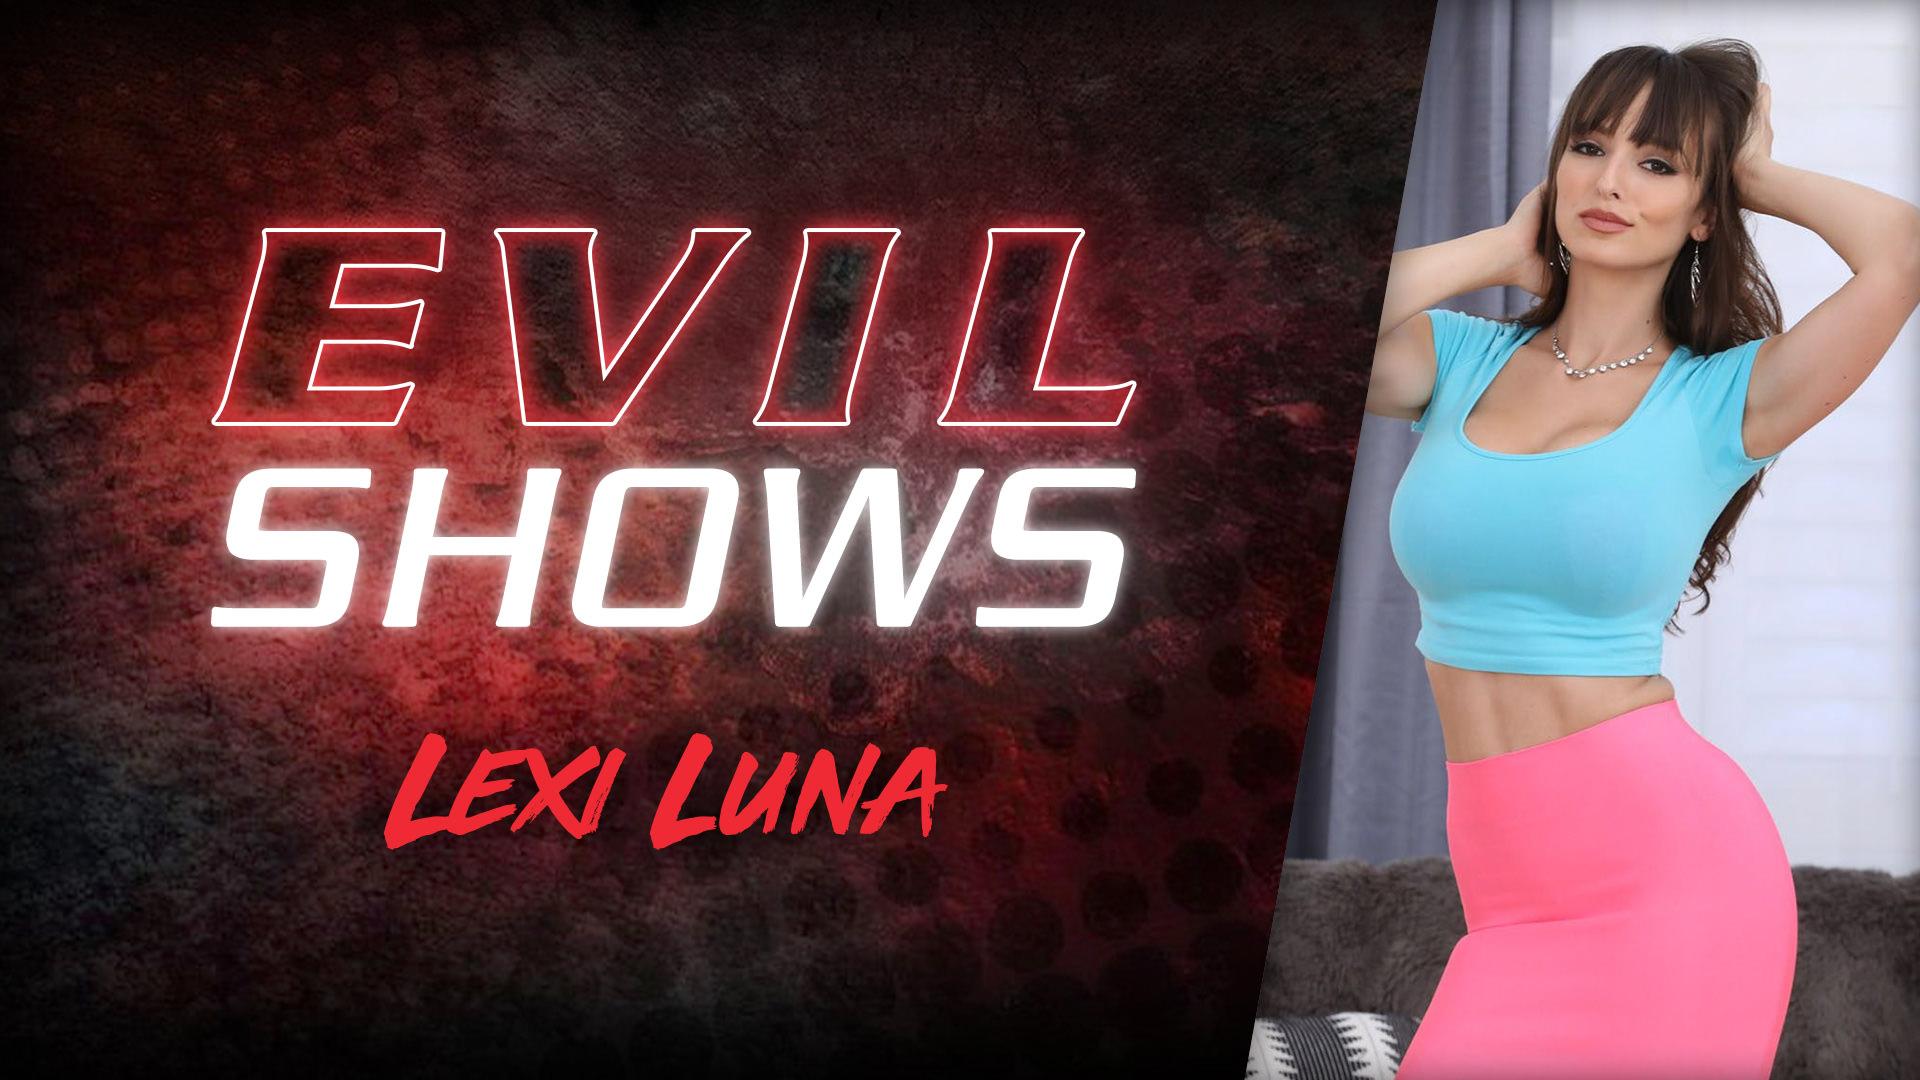 Evil Shows - Lexi Luna - Lexi Luna 1